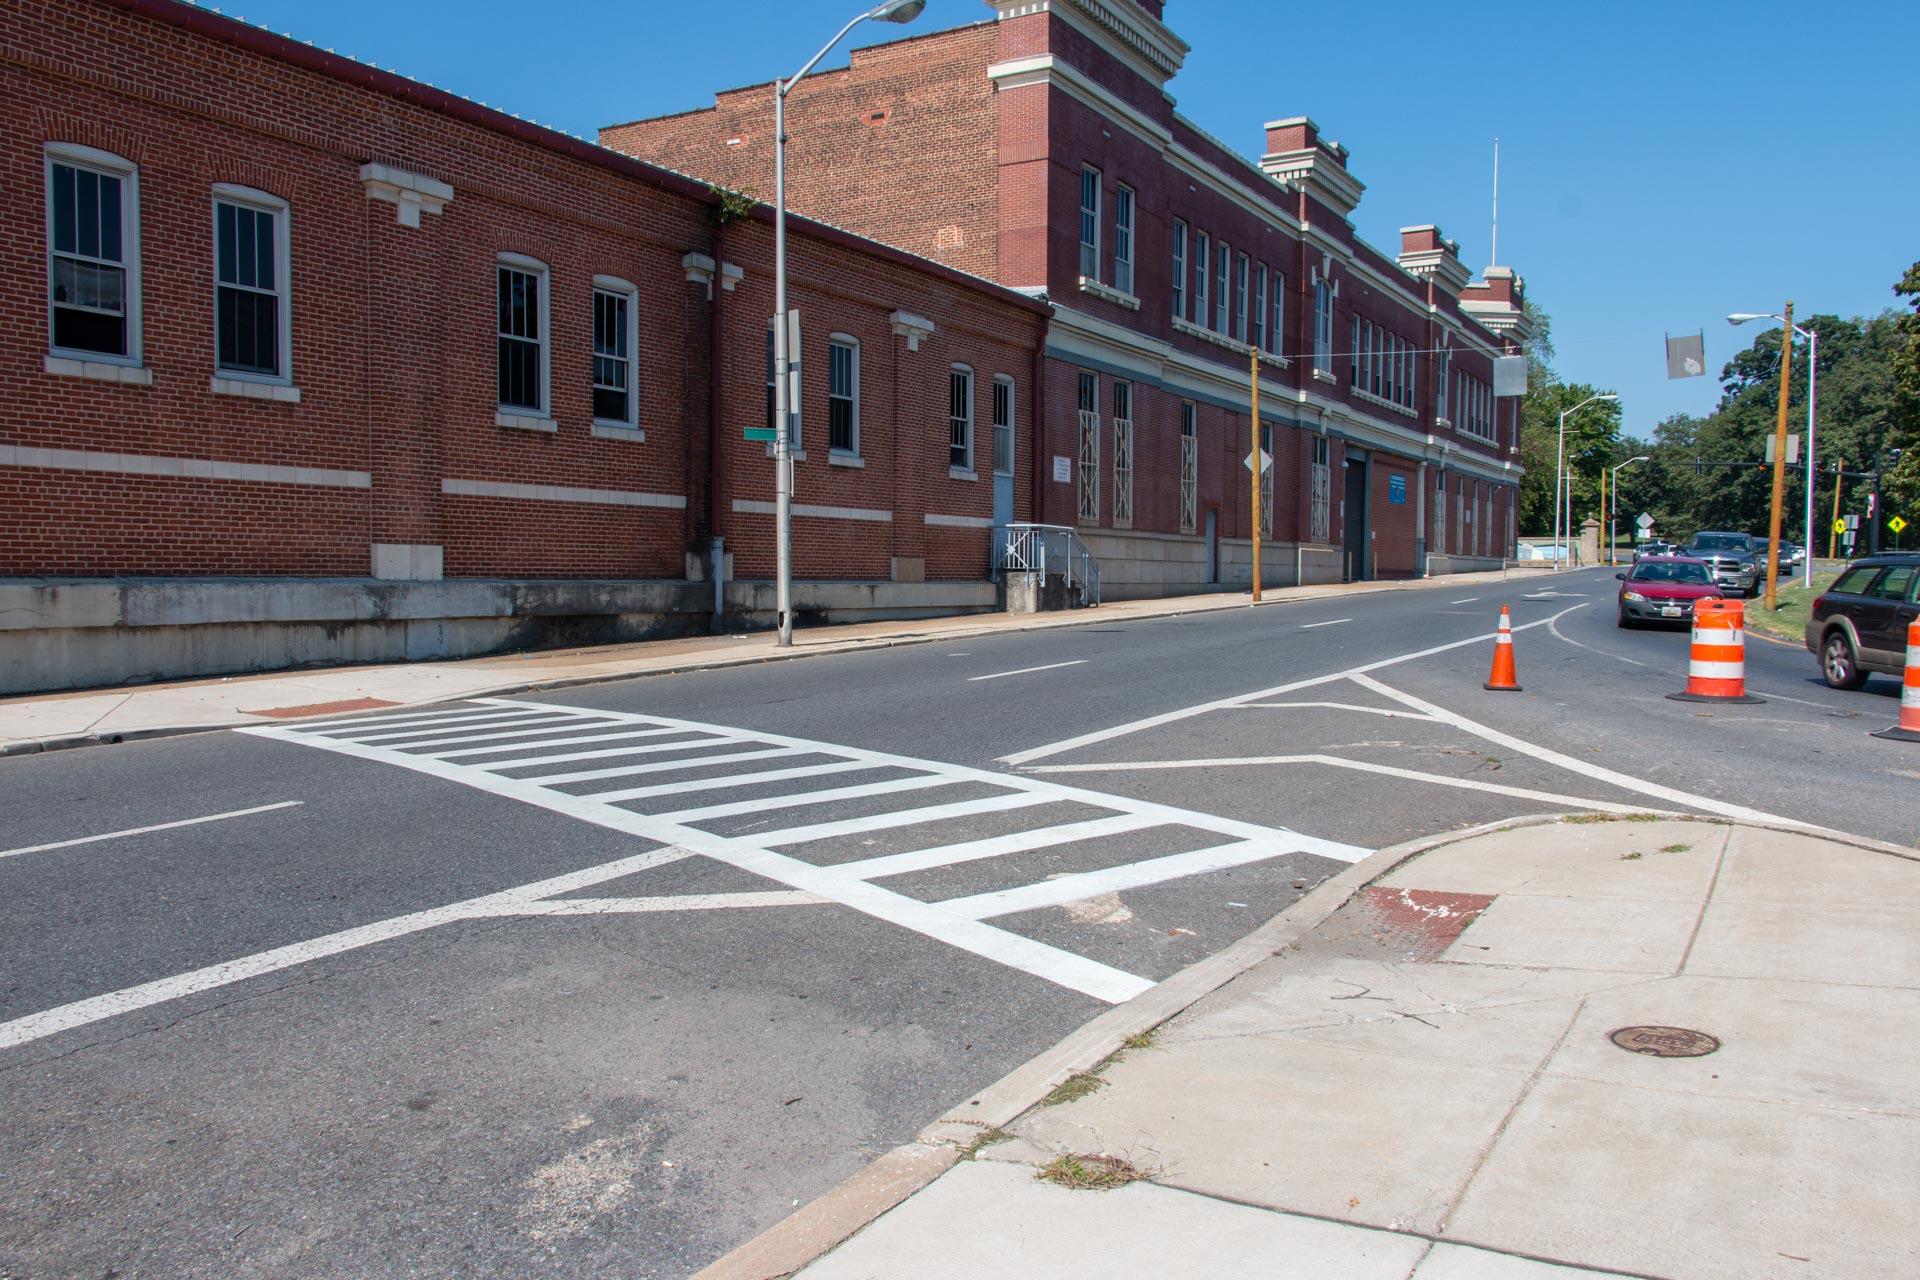 190904 Druid Hill Ave crosswalk after northwest